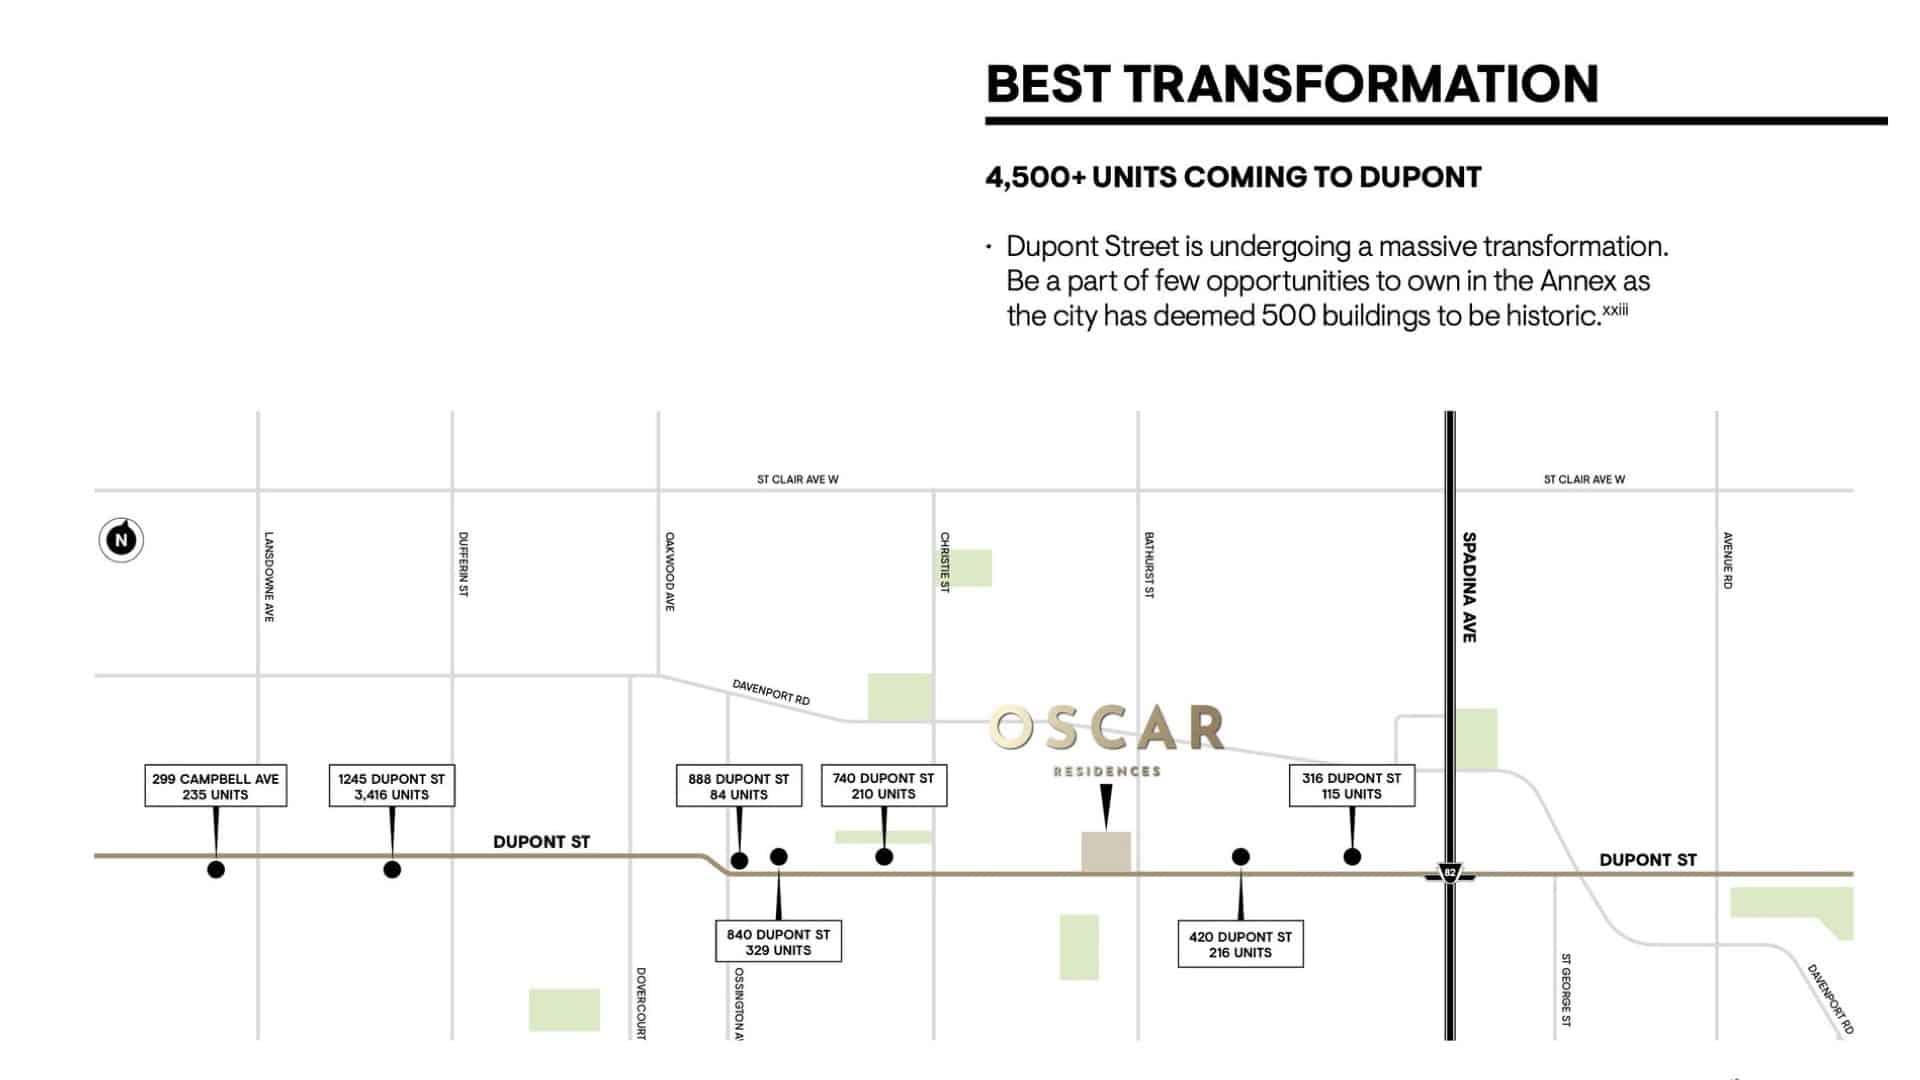 Dupont Street Transformation